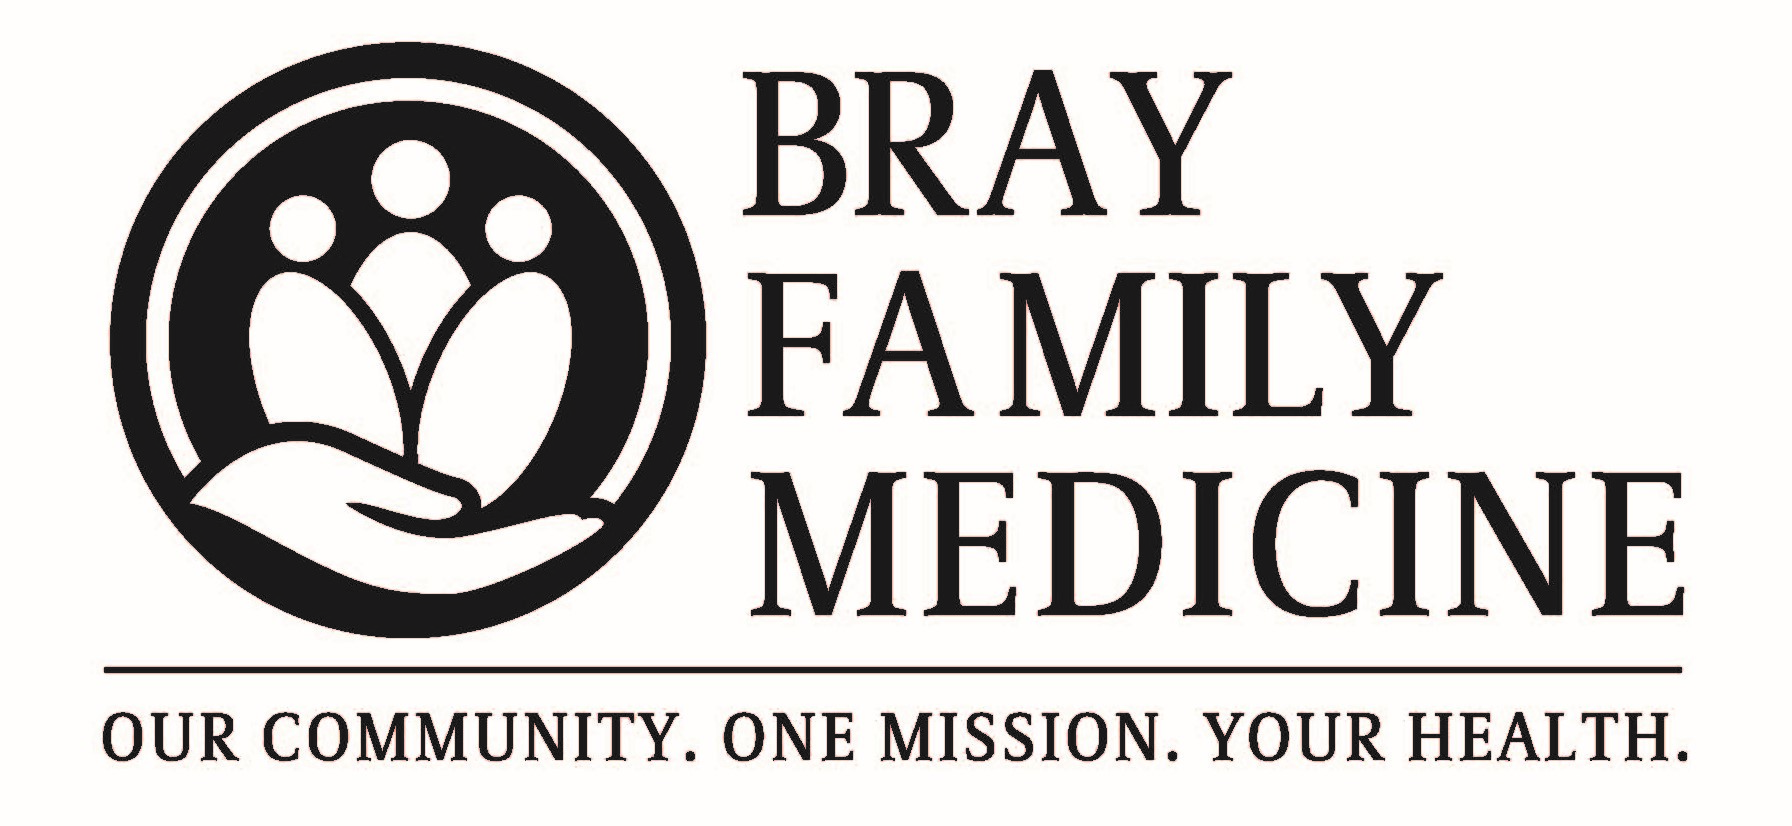 Bray Family Medicine